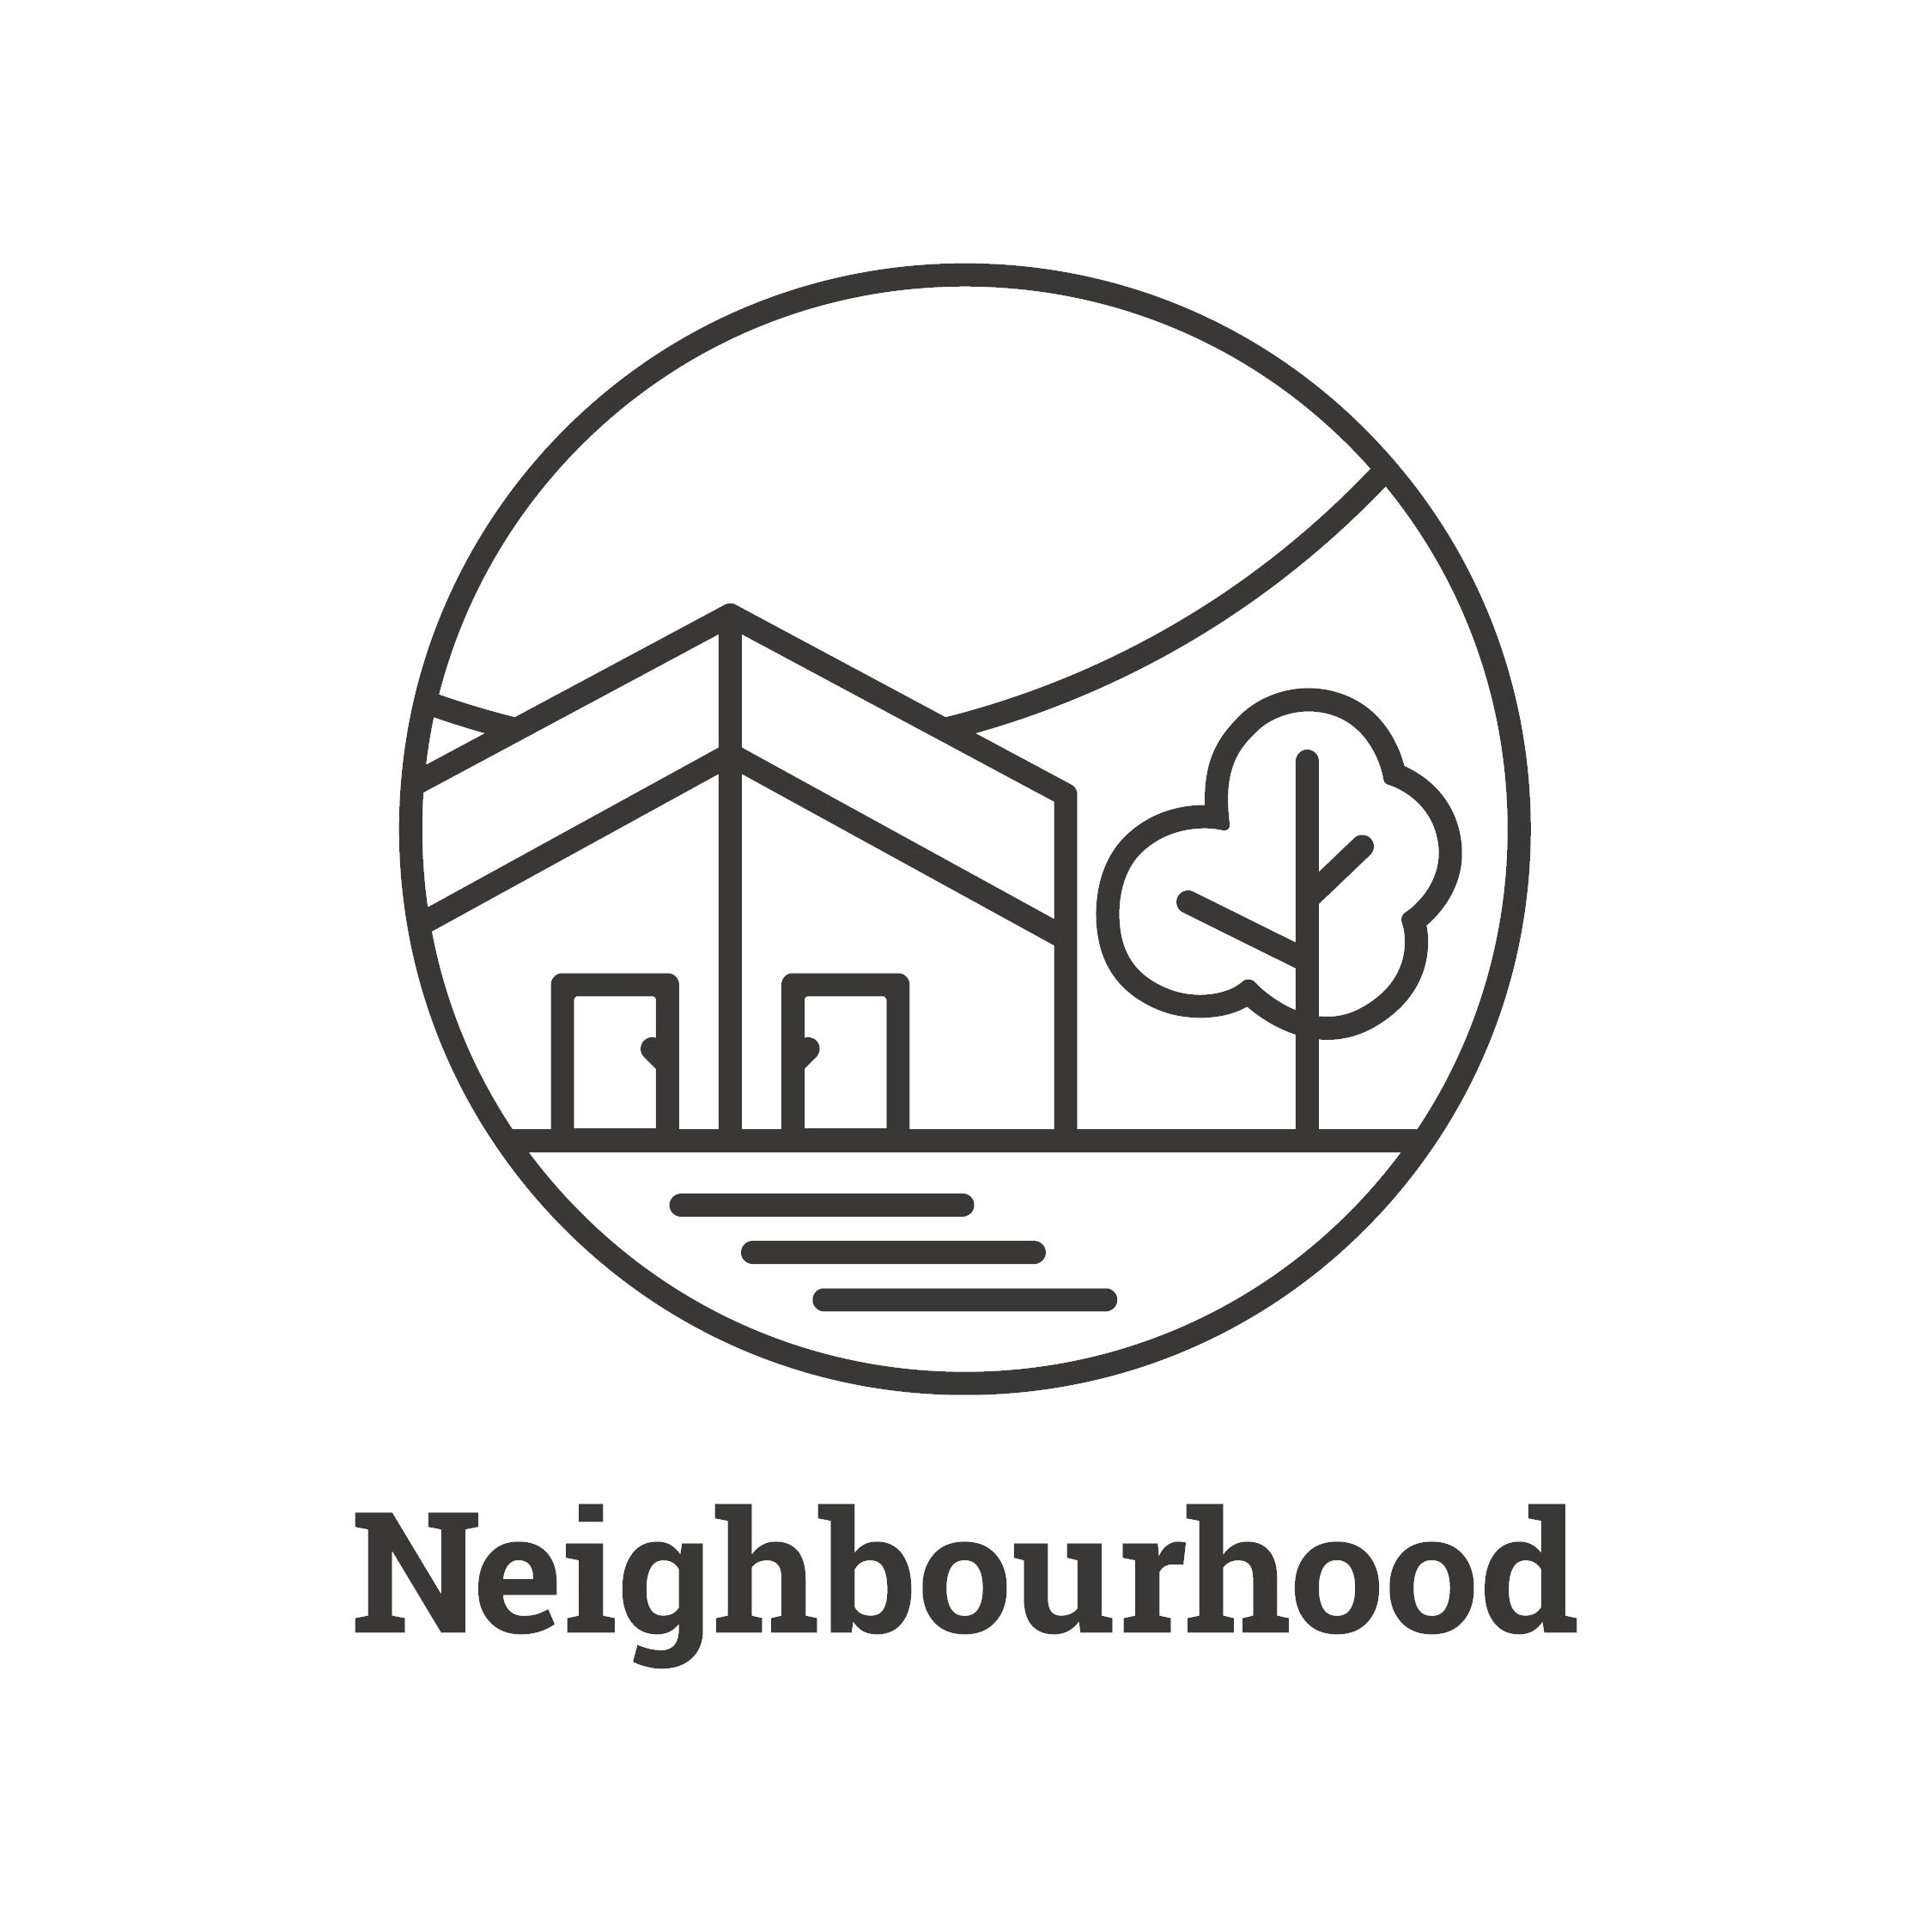 2-Neighbourhood-Master-Sheet-RGB-01 copy.png